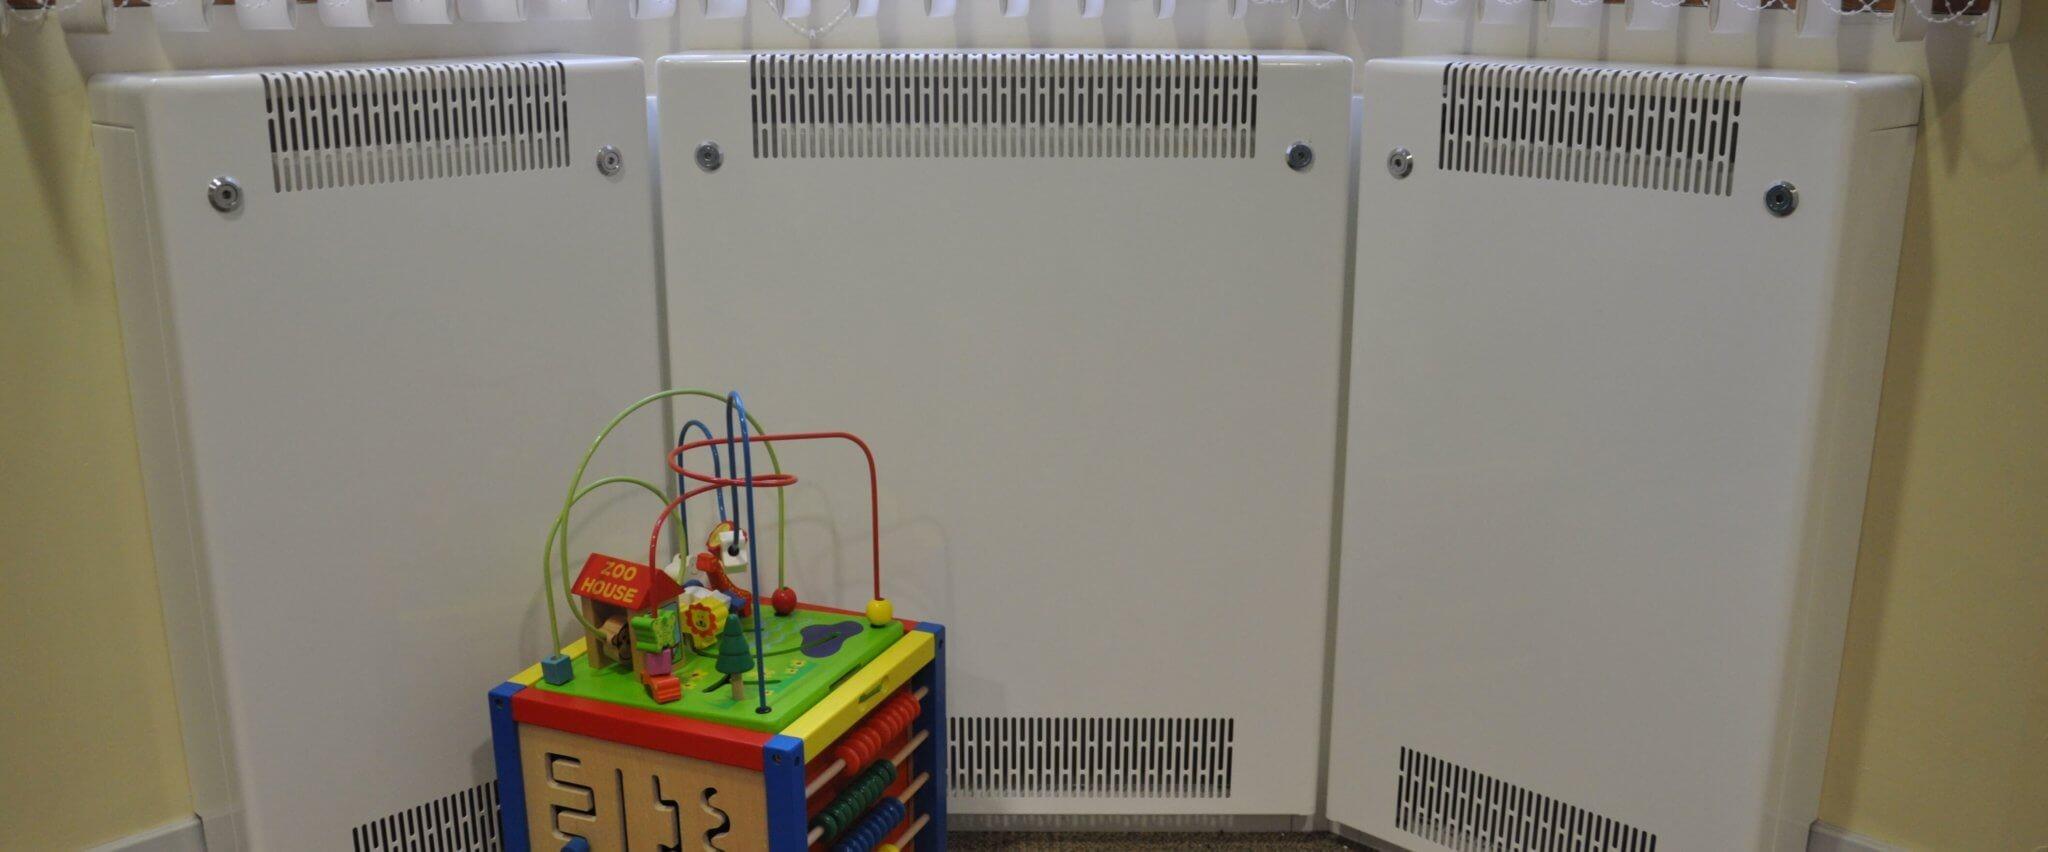 eyfs radiators